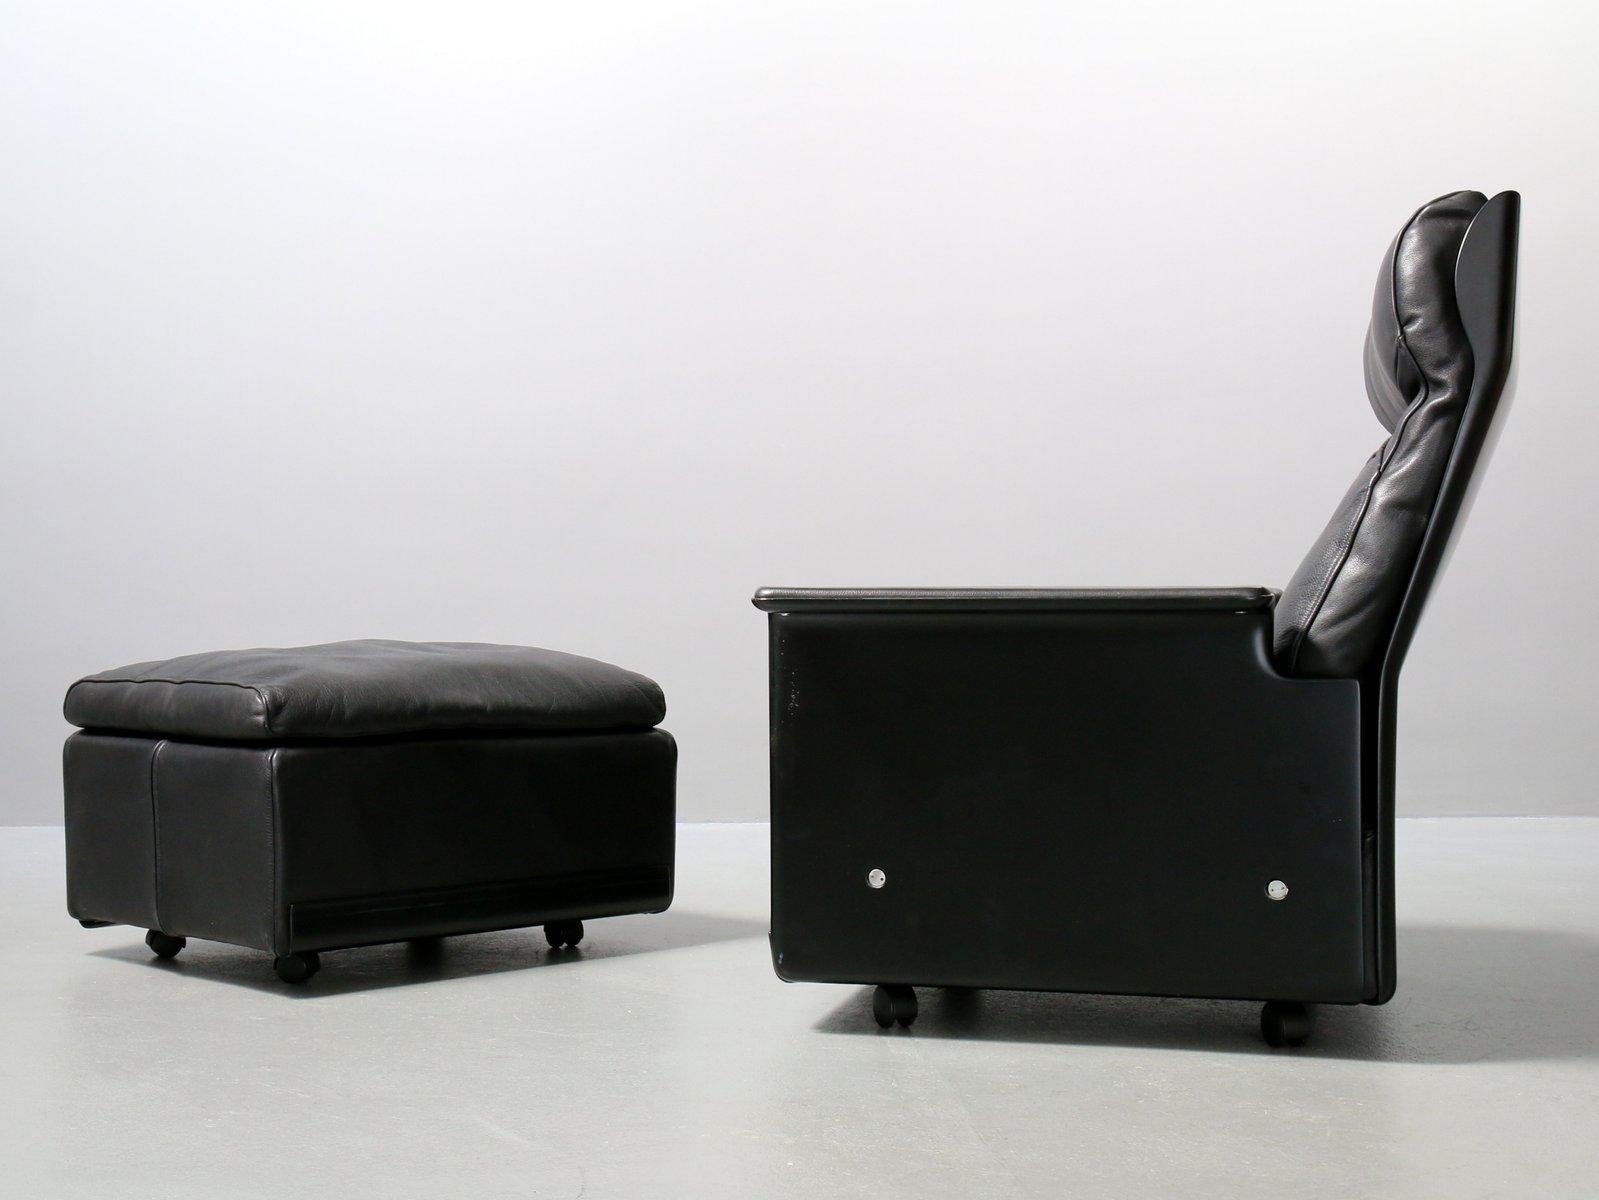 620 ledersessel hocker von dieter rams f r vitsoe 1980er bei pamono kaufen. Black Bedroom Furniture Sets. Home Design Ideas